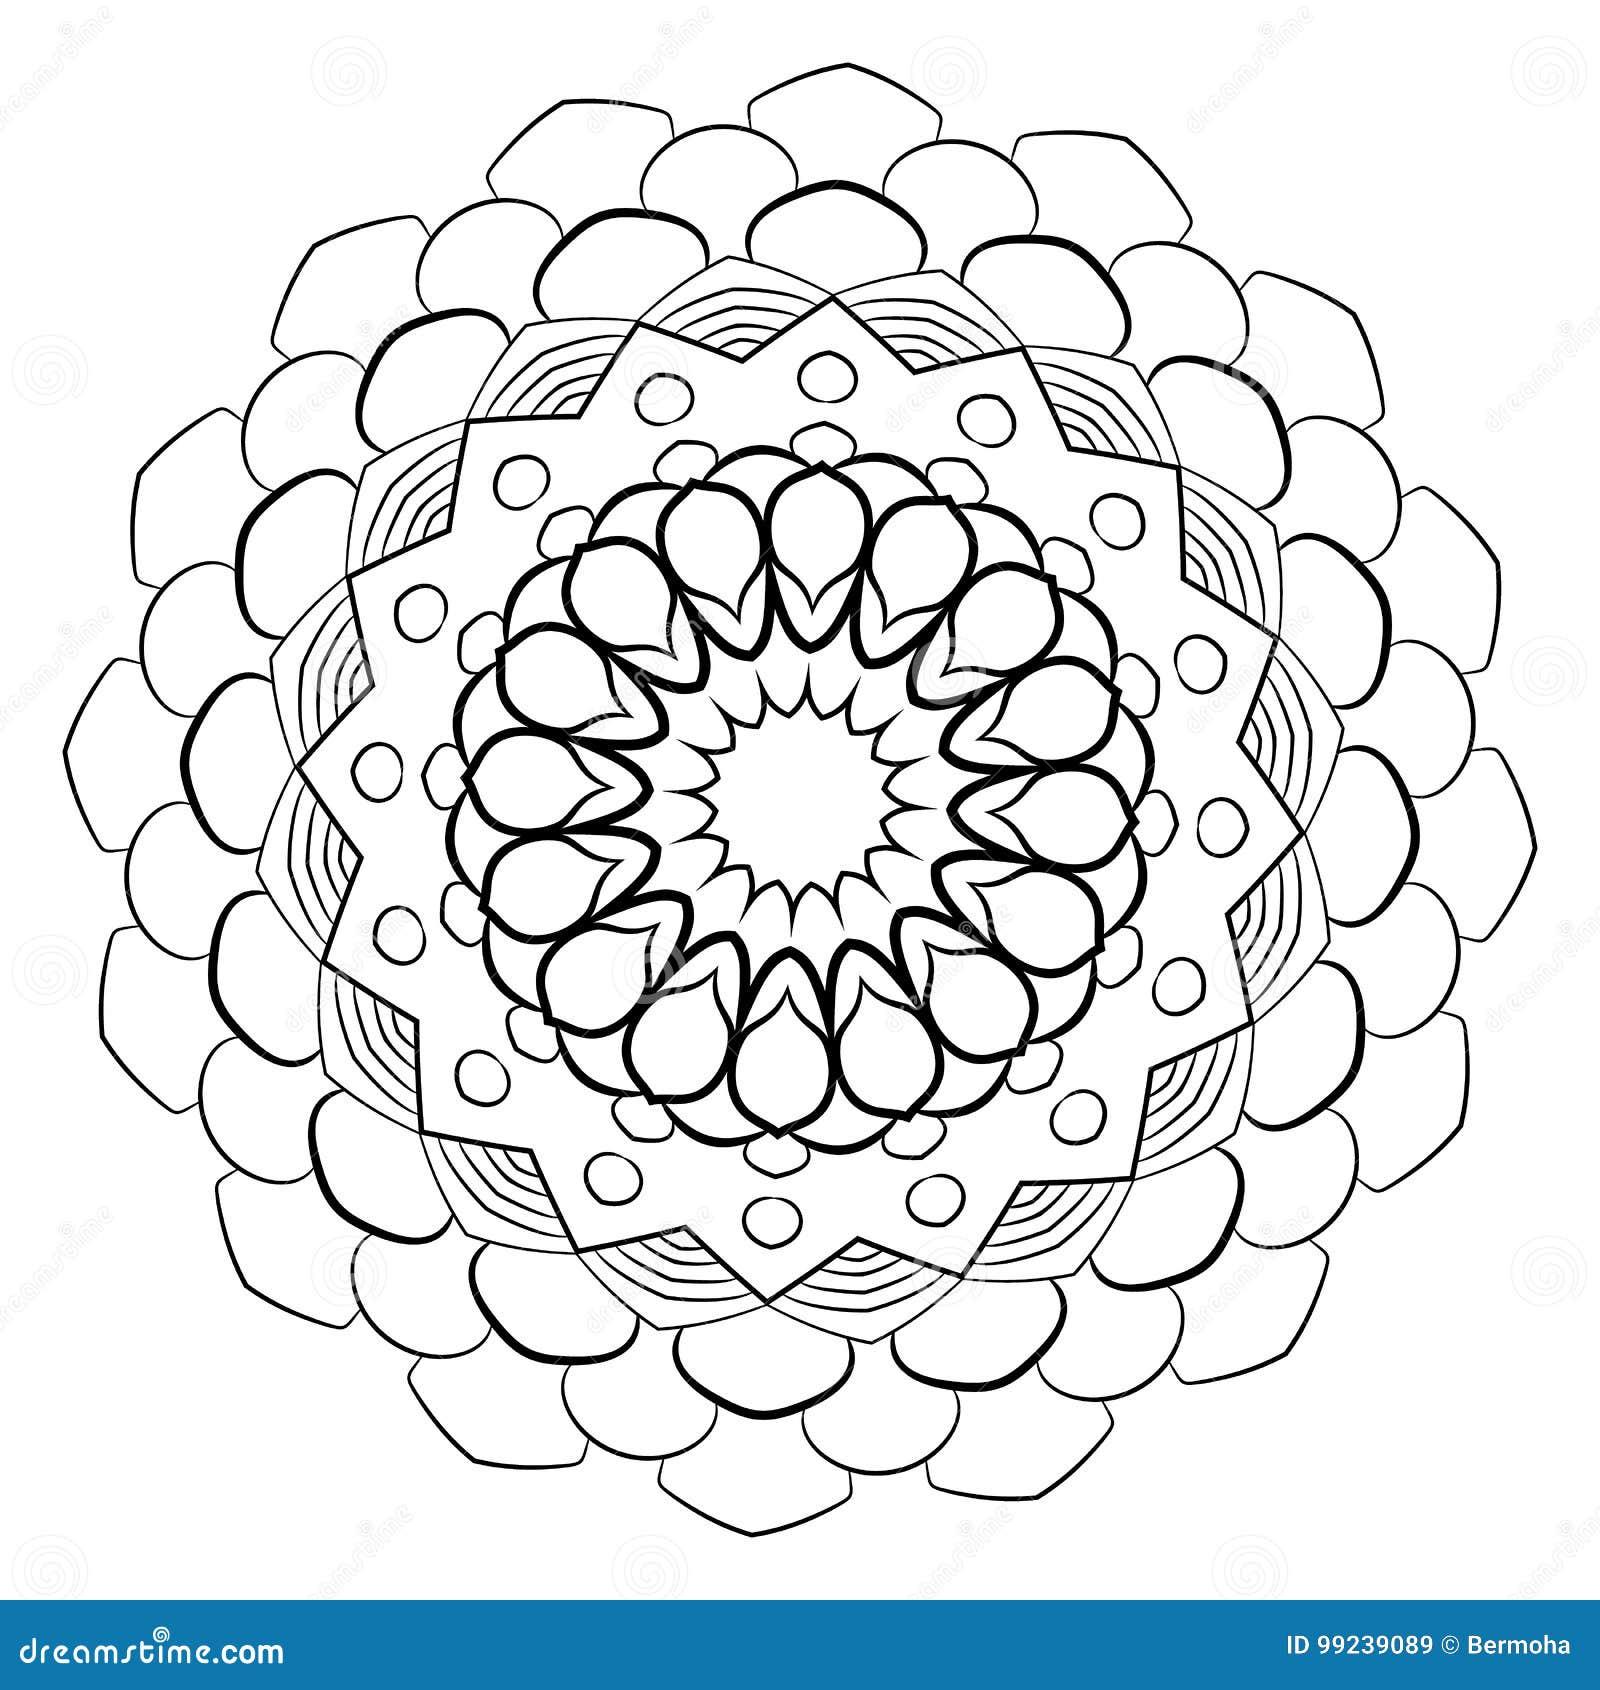 Mandala Kreisformigen Muster Ein Muster Aus